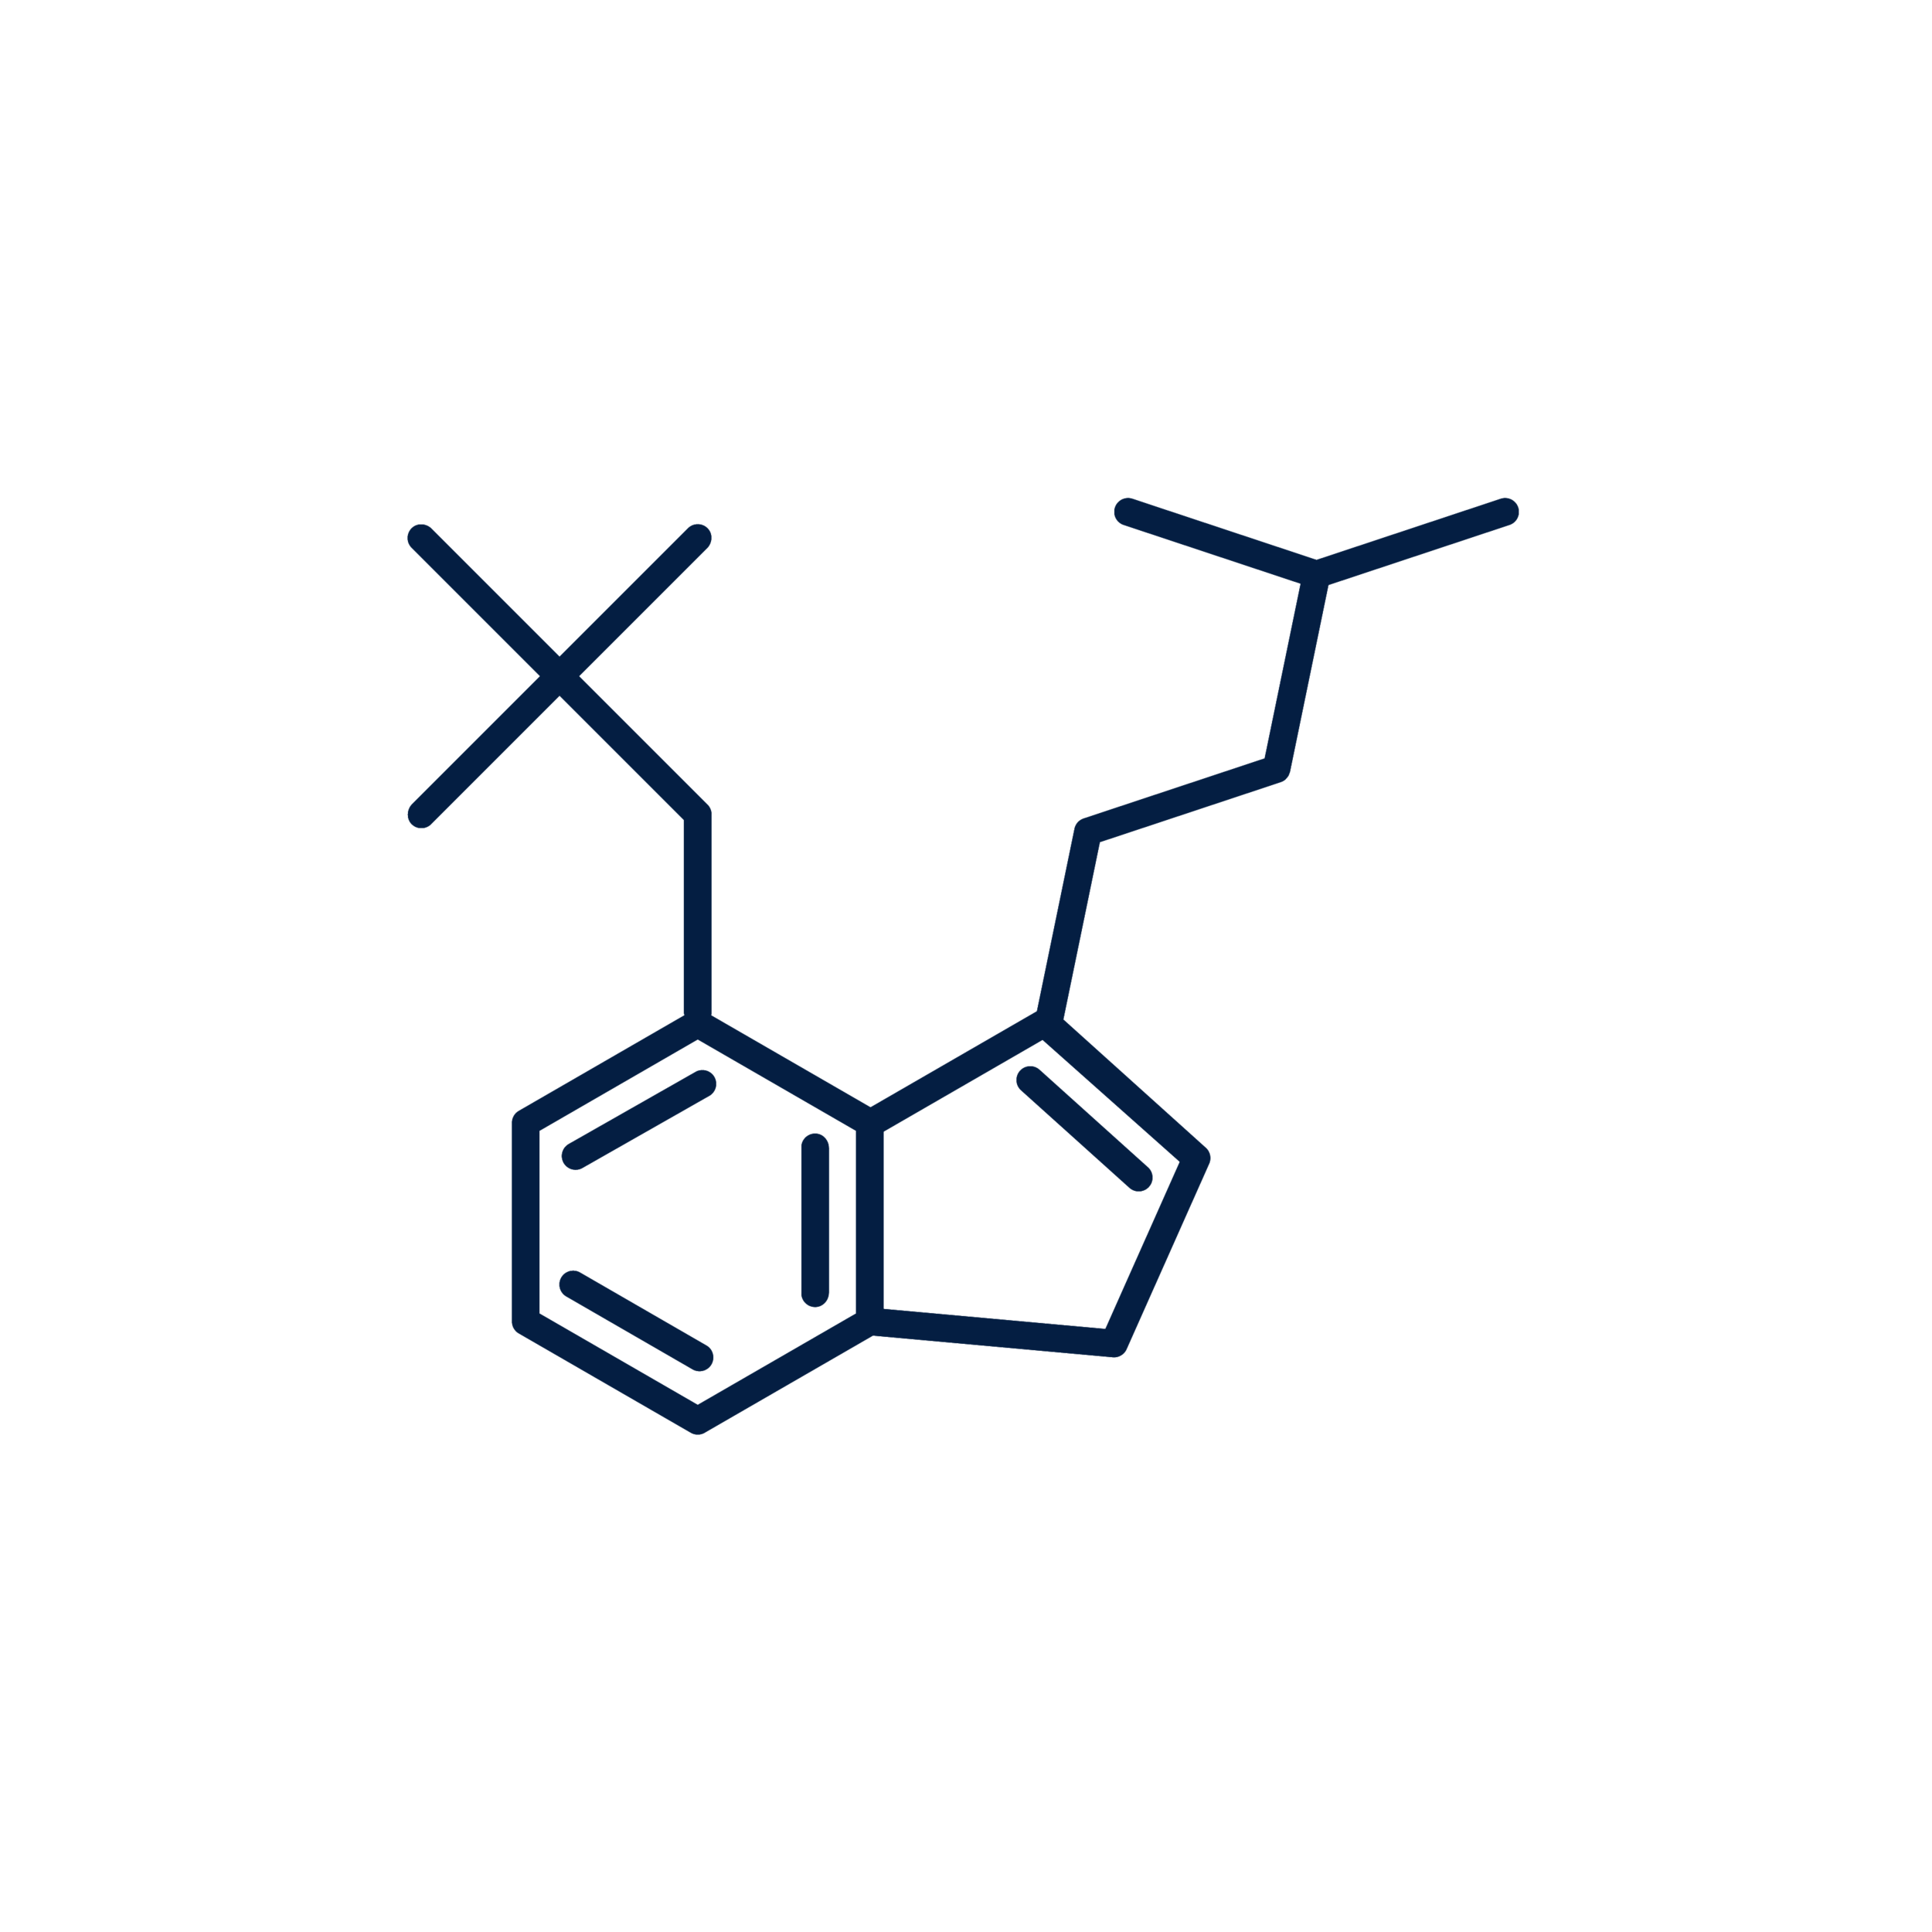 psilocybin.molecule.png